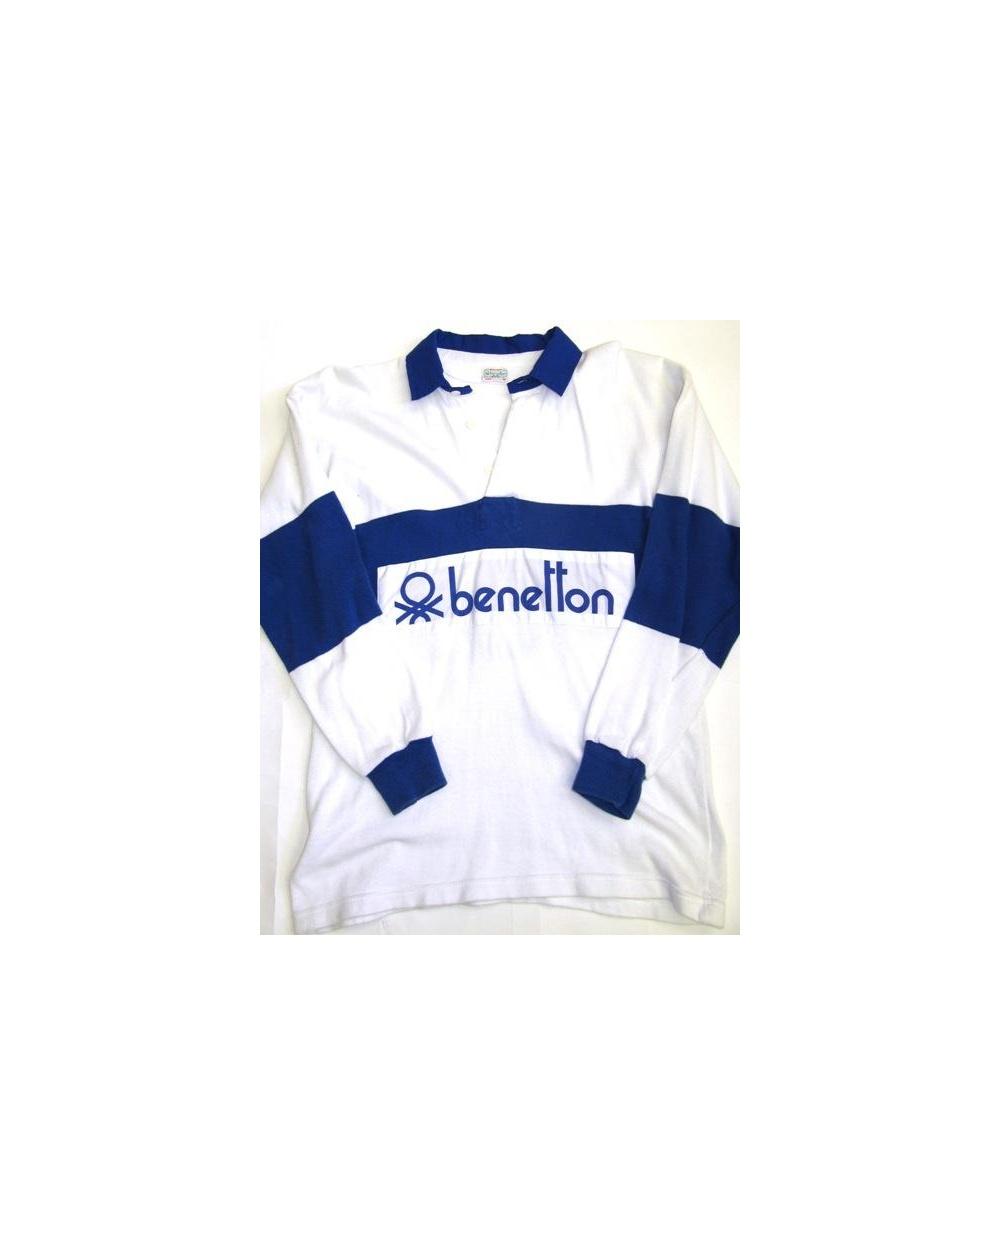 f4beace06a4 Benetton Rugby Vintage 80s Sweatshirt White Navy - Vintage Benetton ...